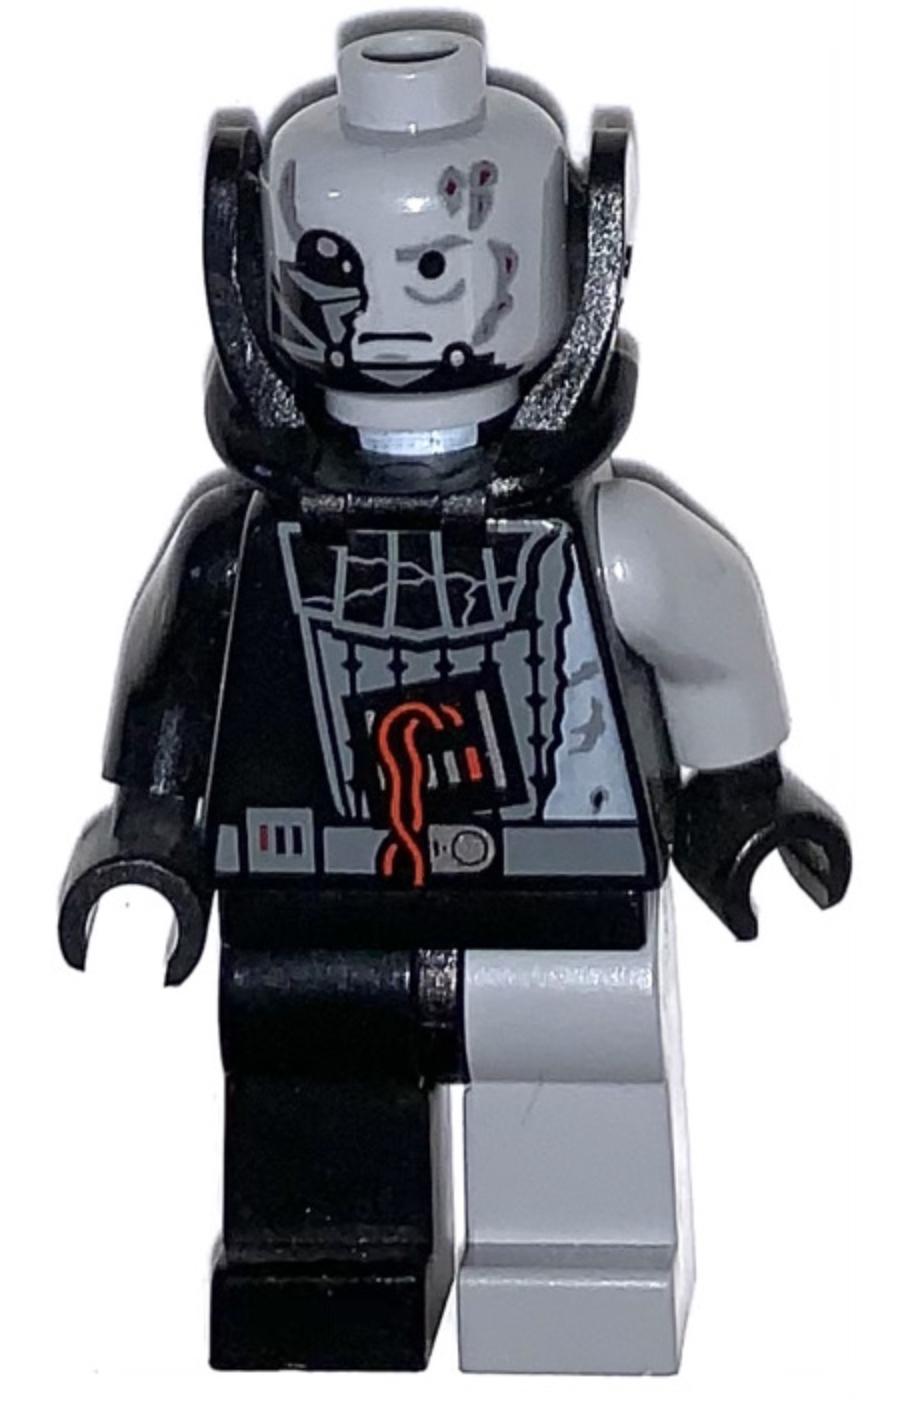 Lego Anakin Skywalker 8096 Battle Damaged Darth Vader Helmet Minifigure